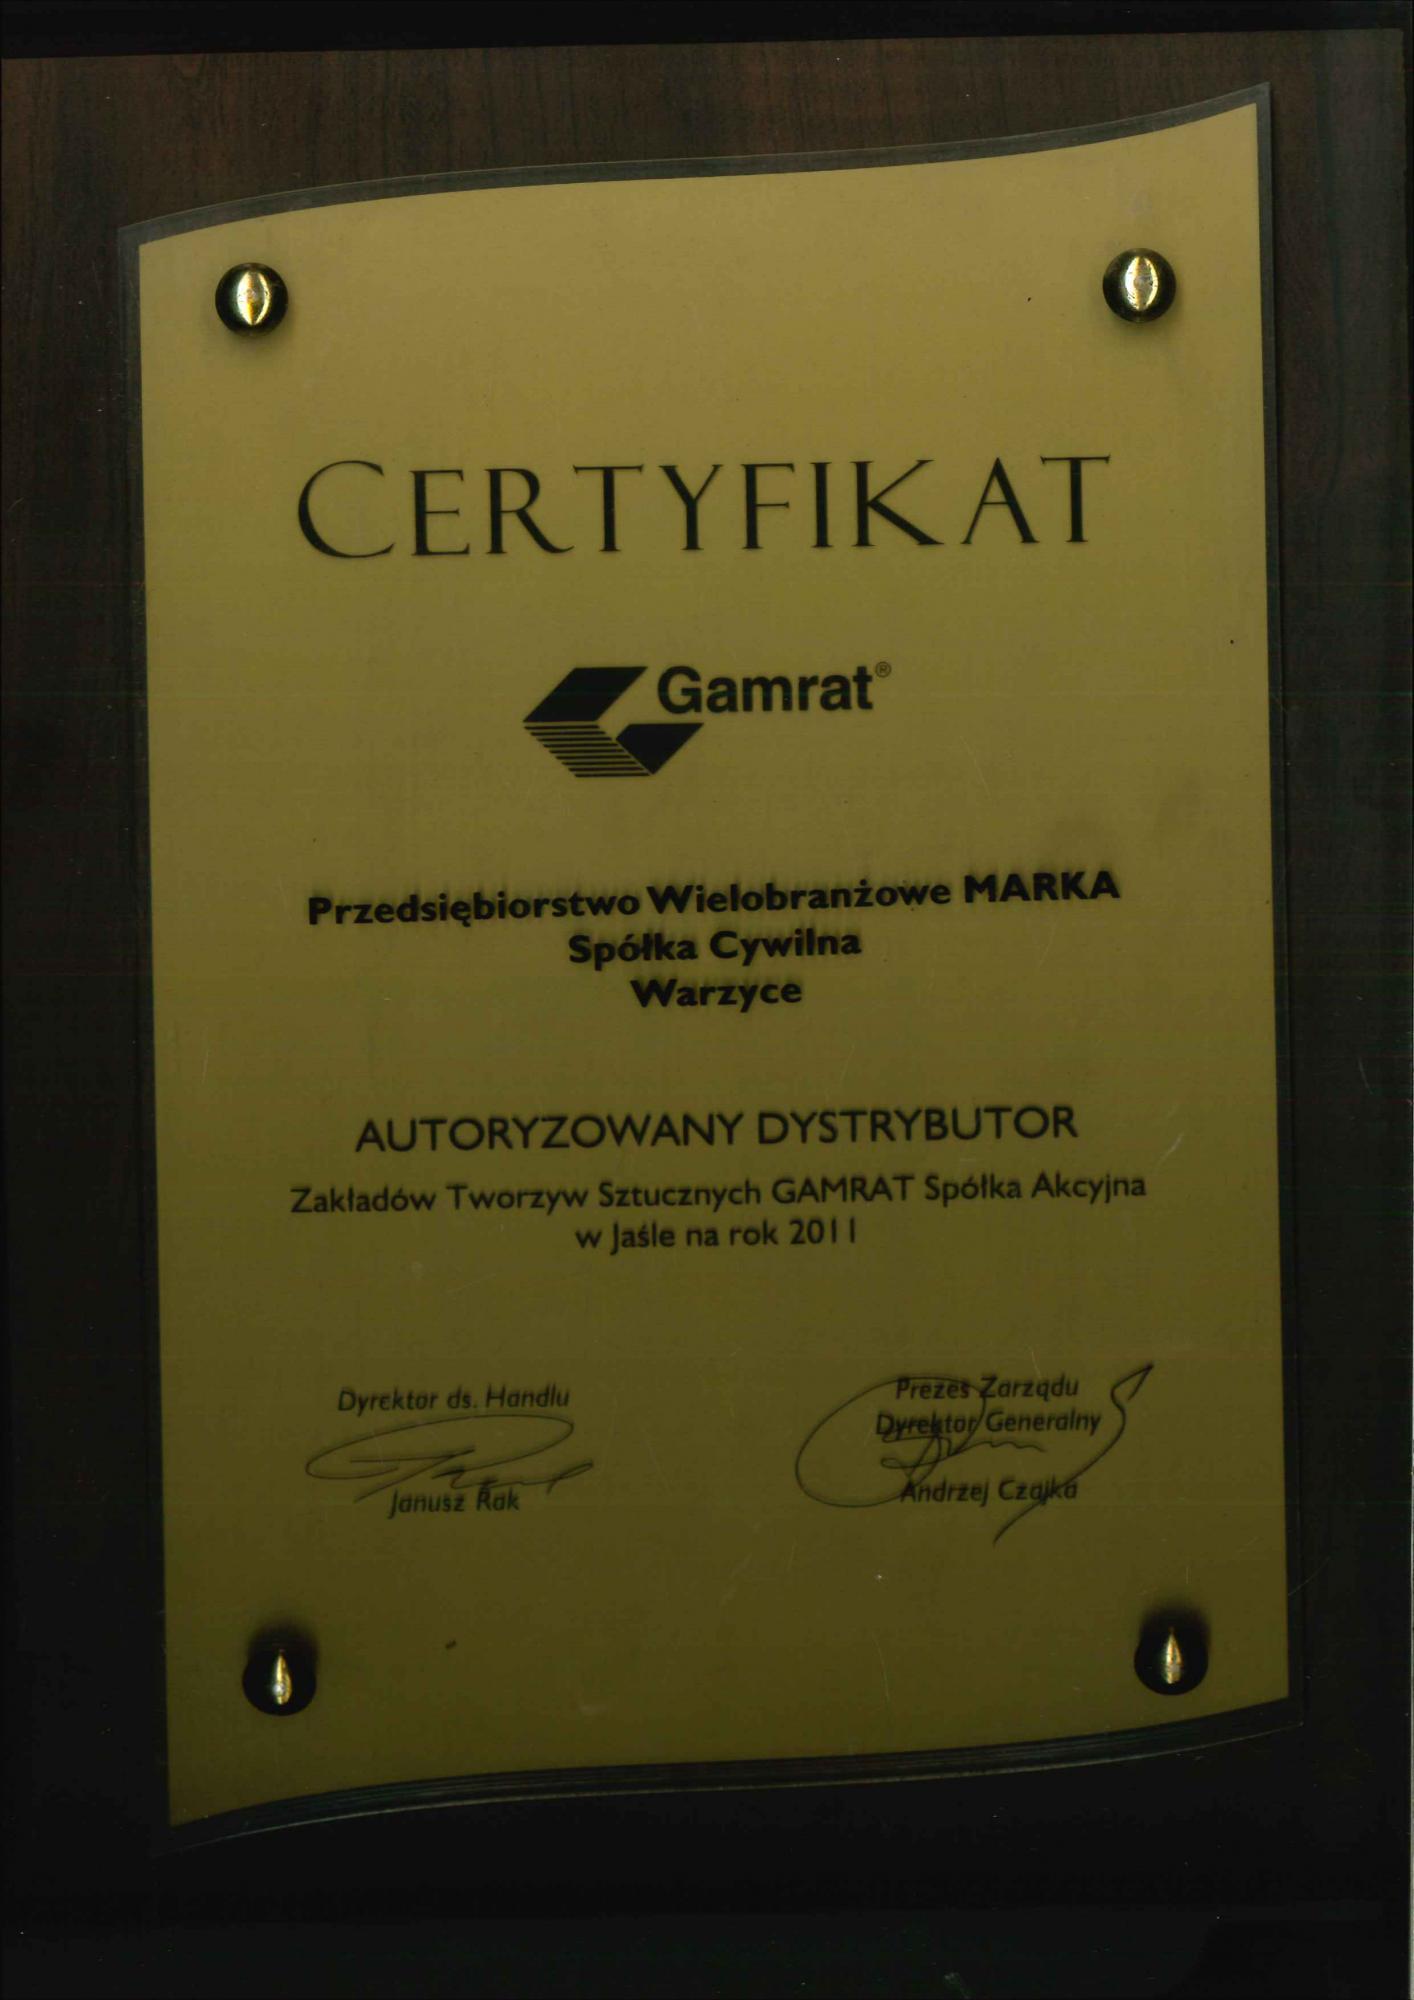 Certyfikat Gamrat 2011